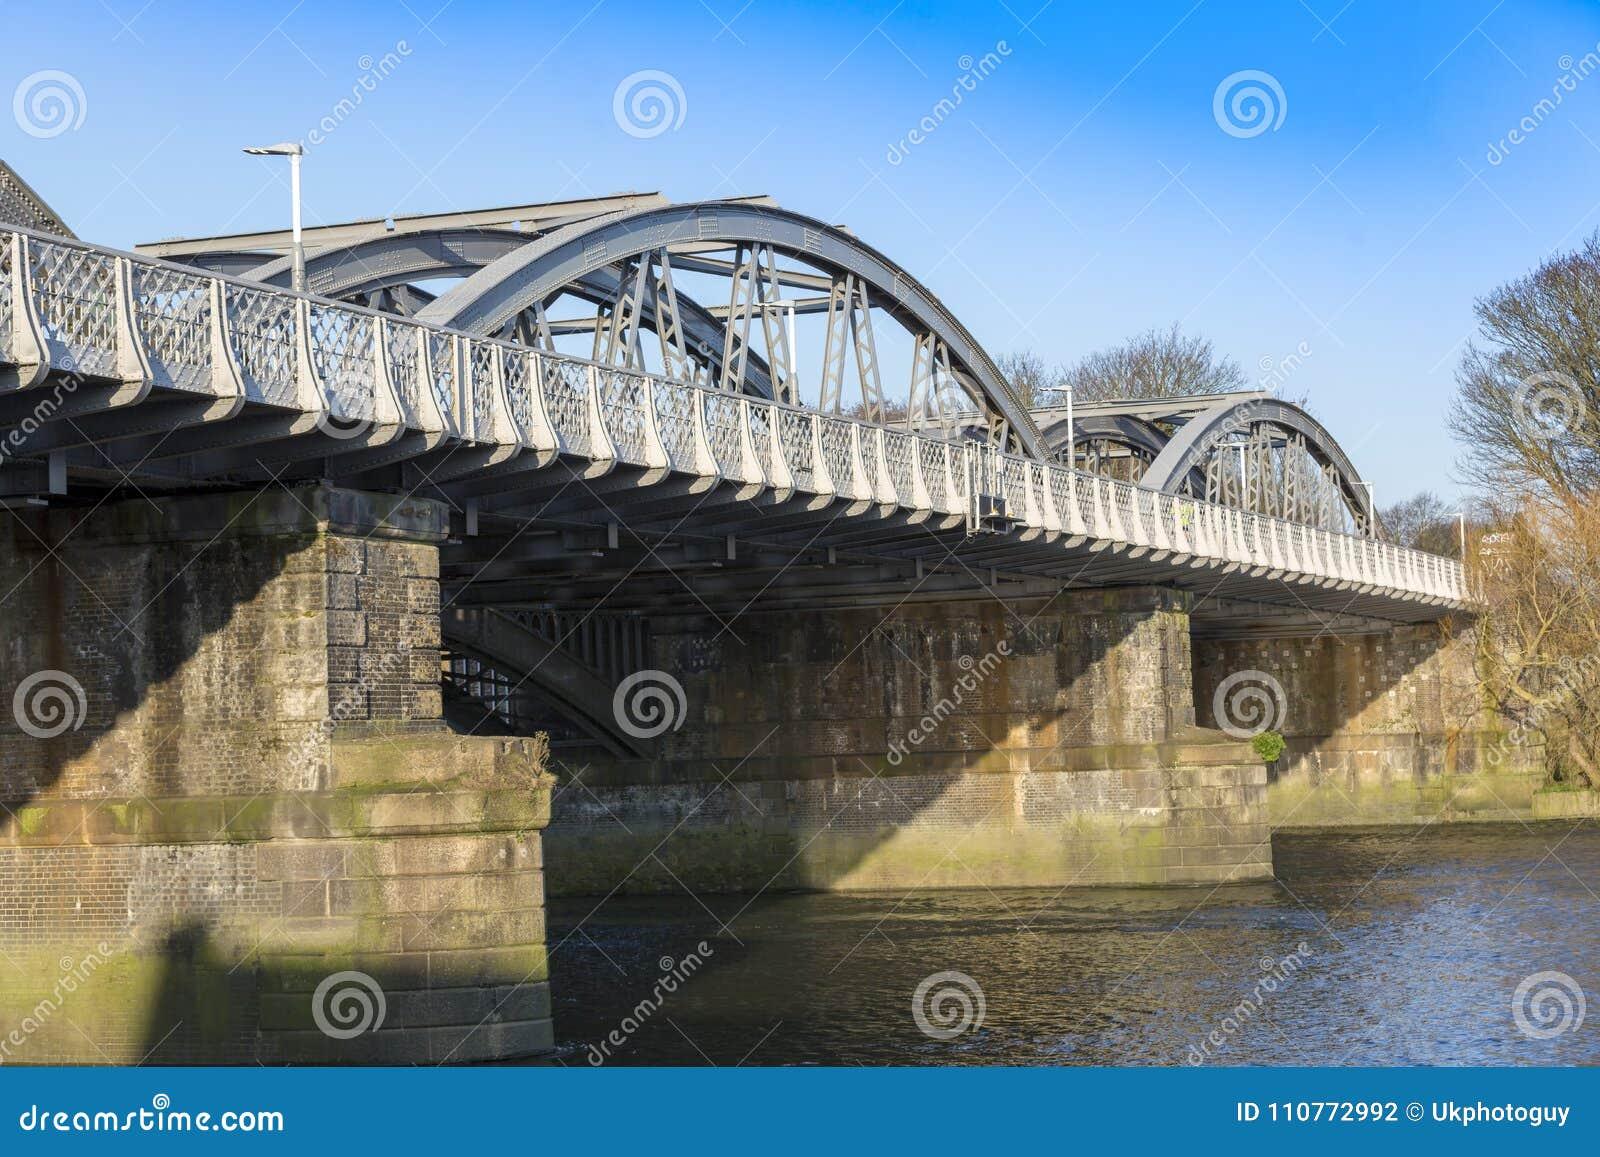 Barnes Railway Bridge, Over The River Thames, London, UK ...